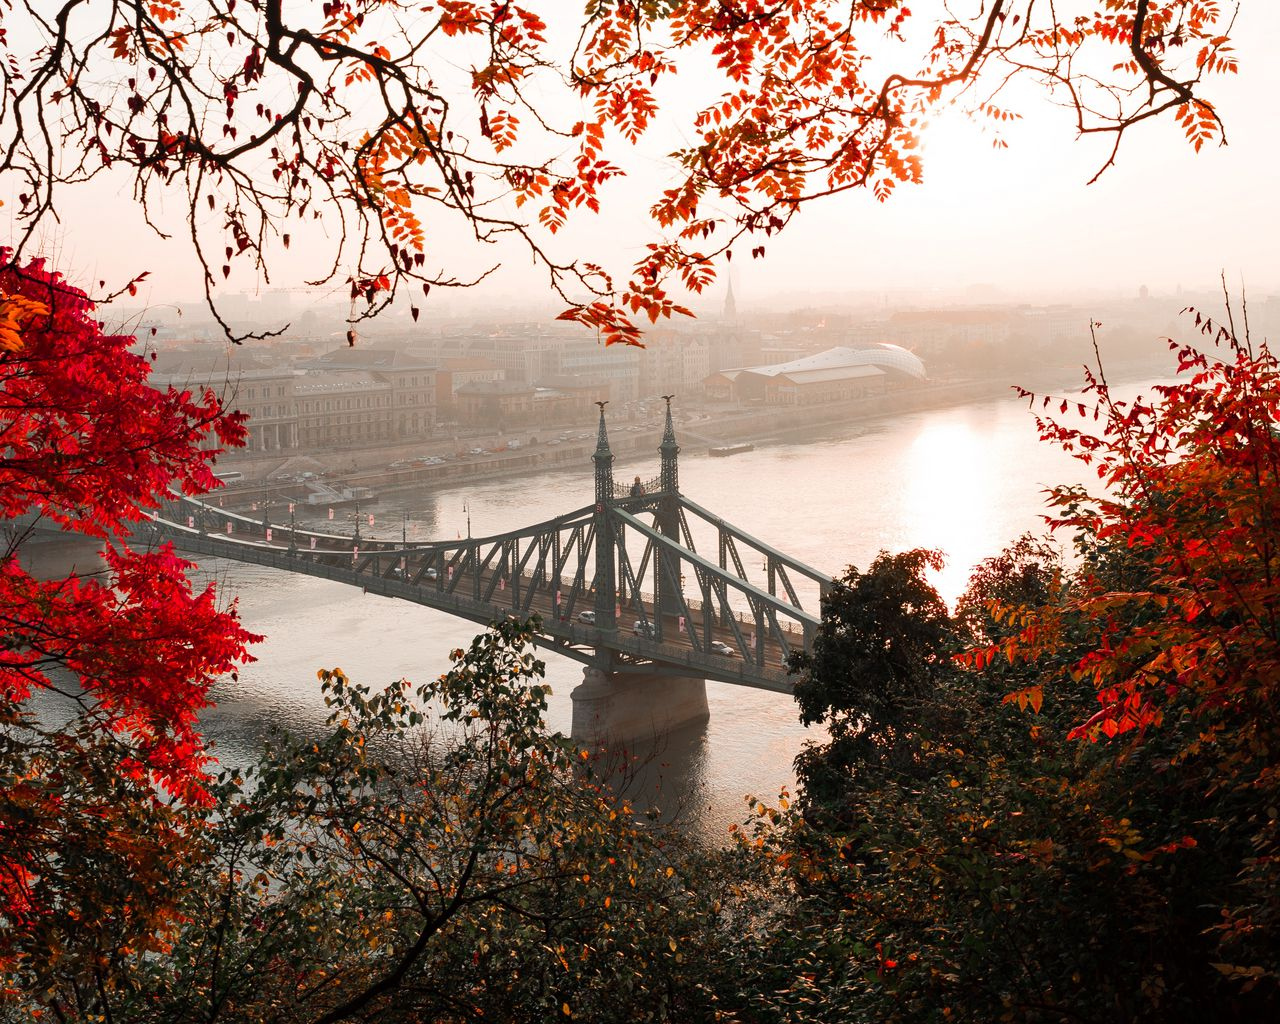 1280x1024 Wallpaper bridge, autumn, city, citadella, budapest, hungary